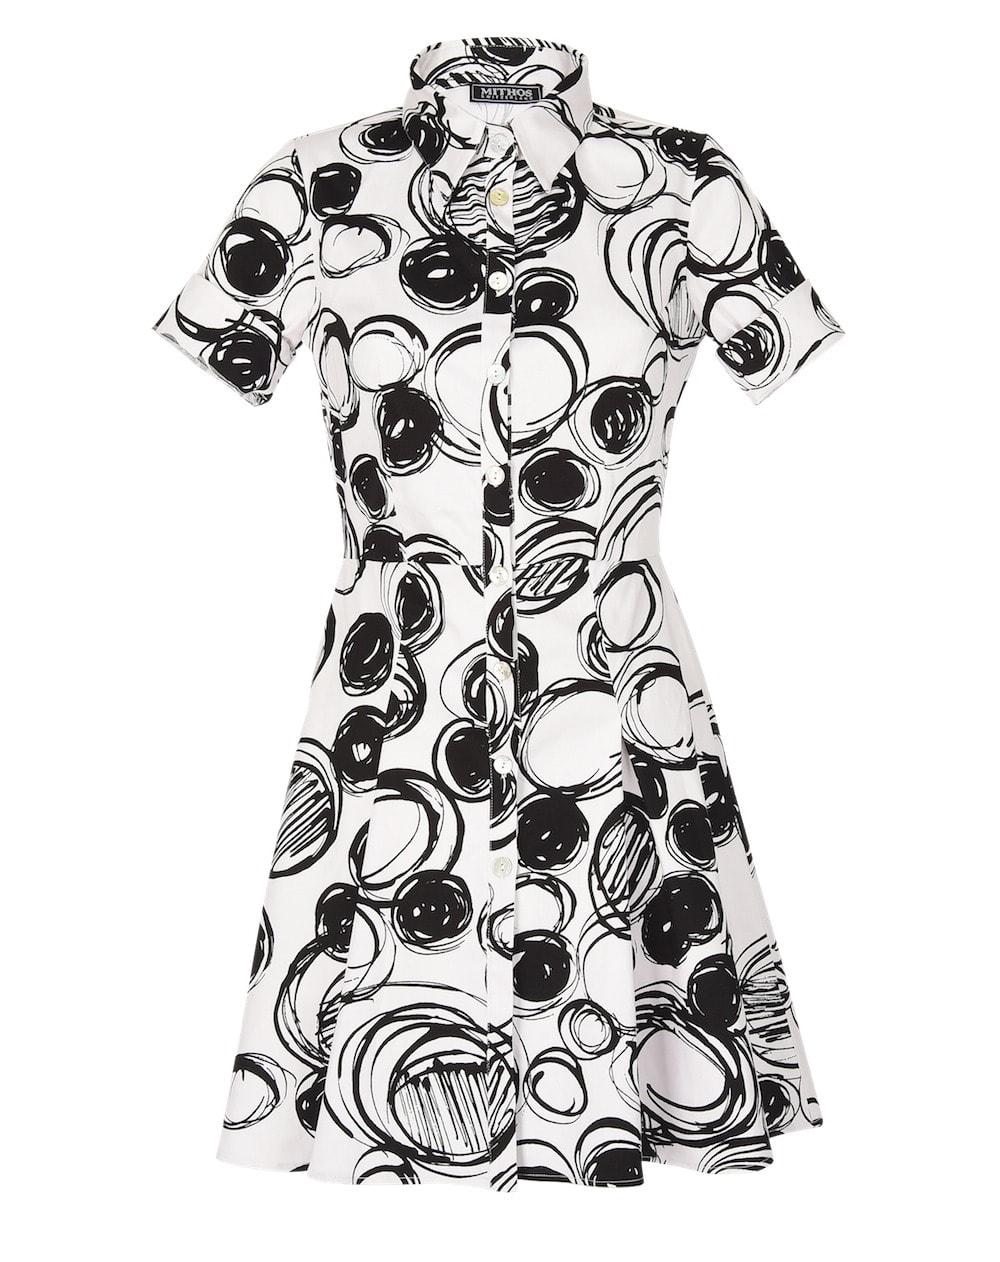 Kleid in 360 Grad